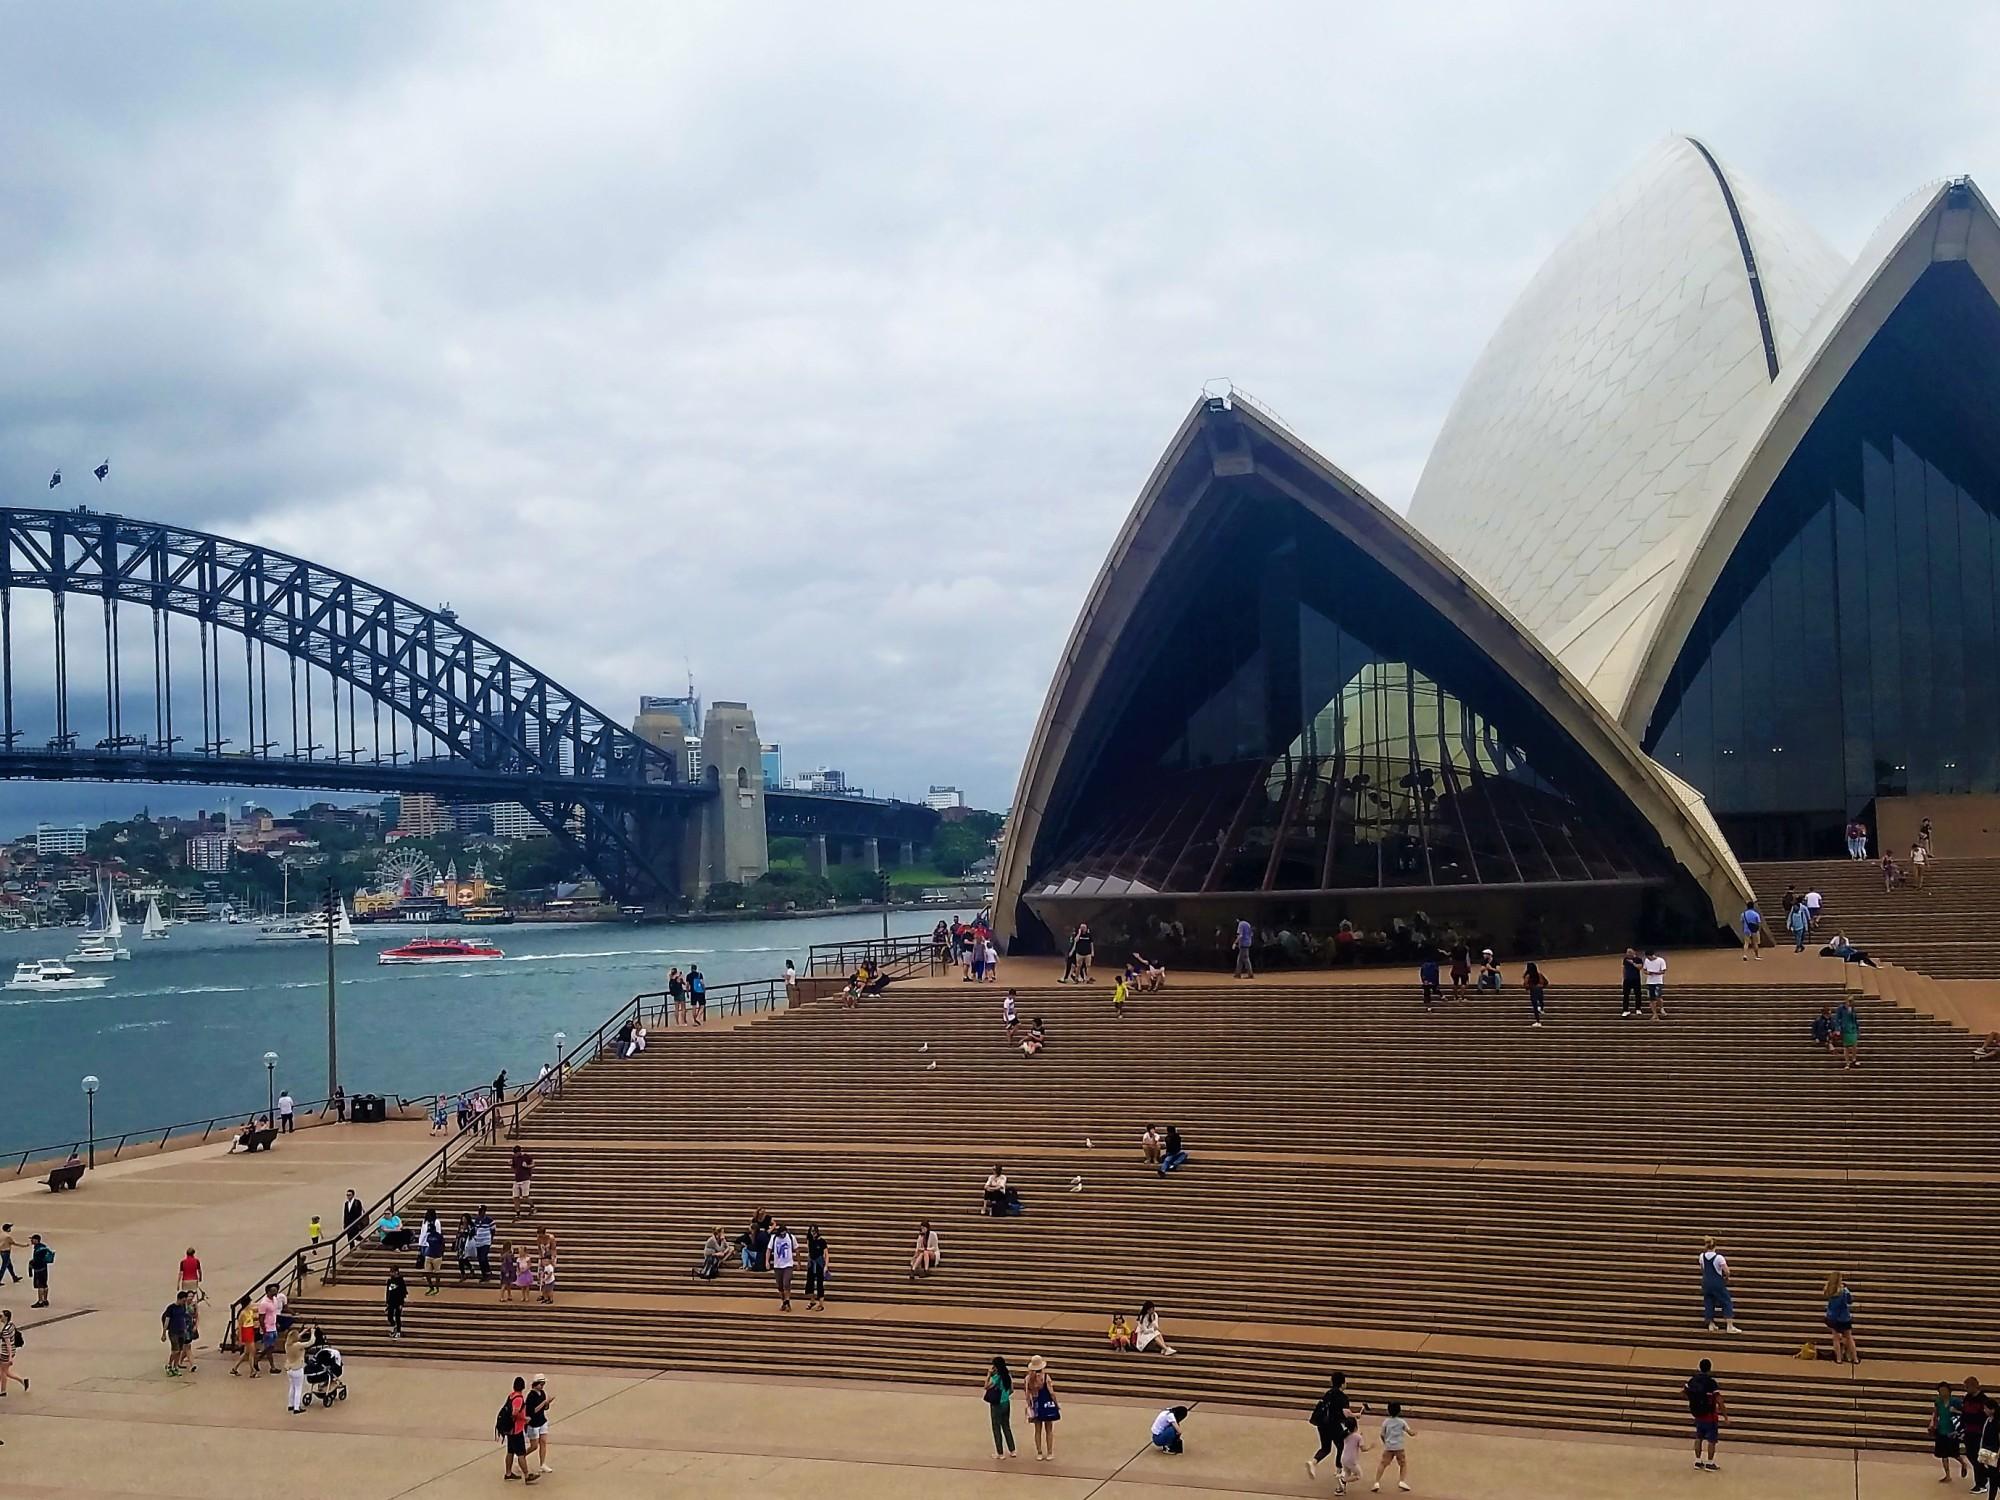 Australia Travel Guide | Sydney City Tour | Sydney Harbor Lunch Cruise | Guide Tour of Sydney Opera House